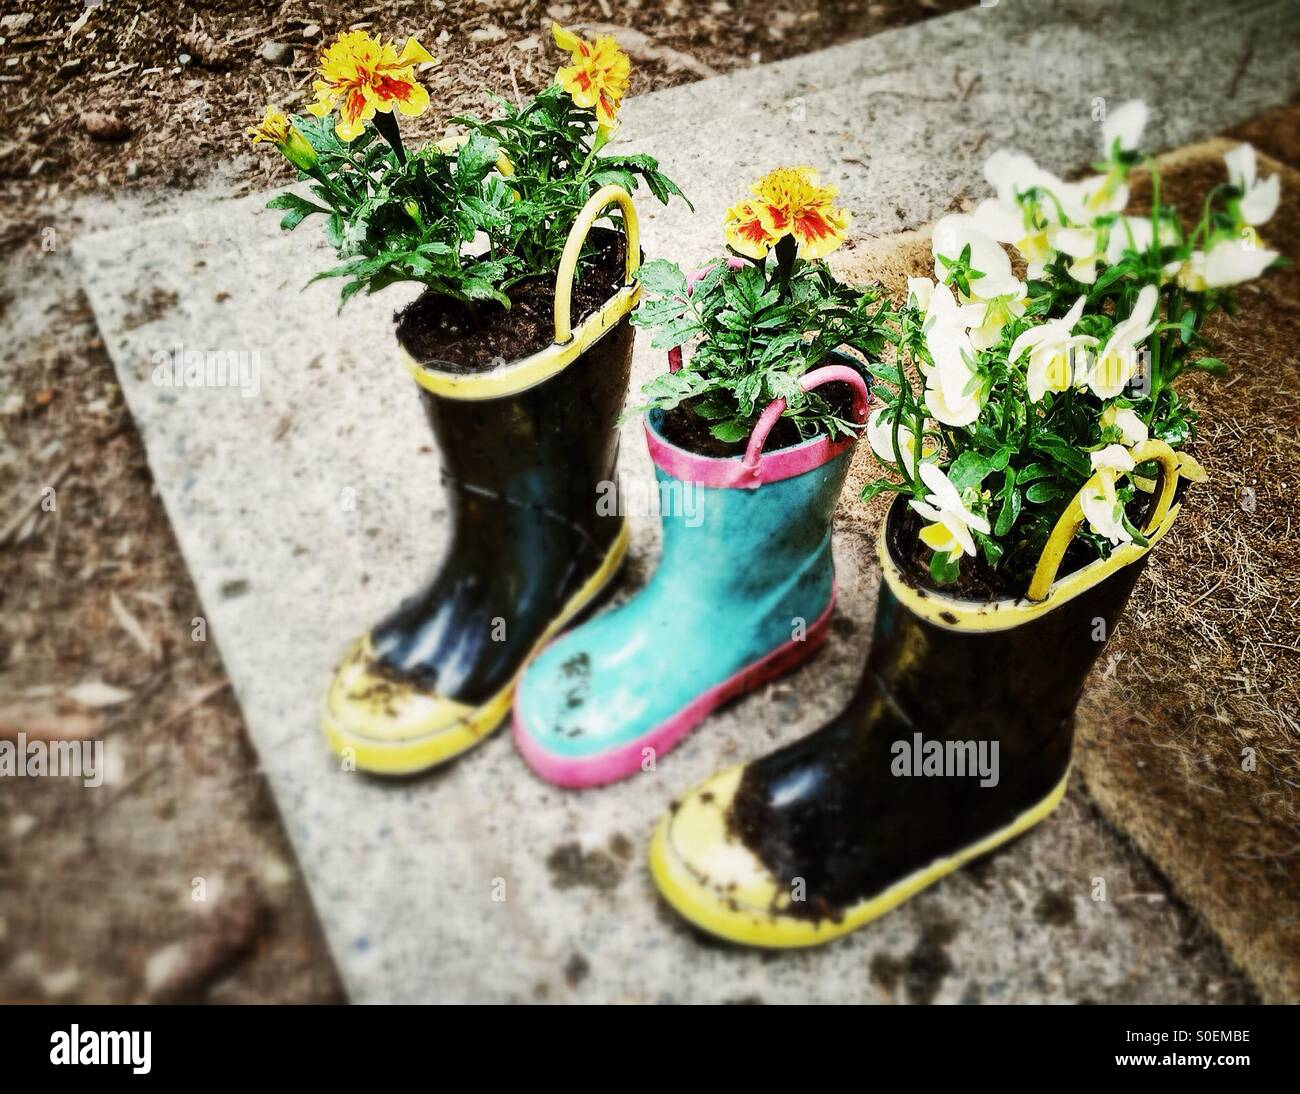 Blumen in Kinderstiefel Stockbild